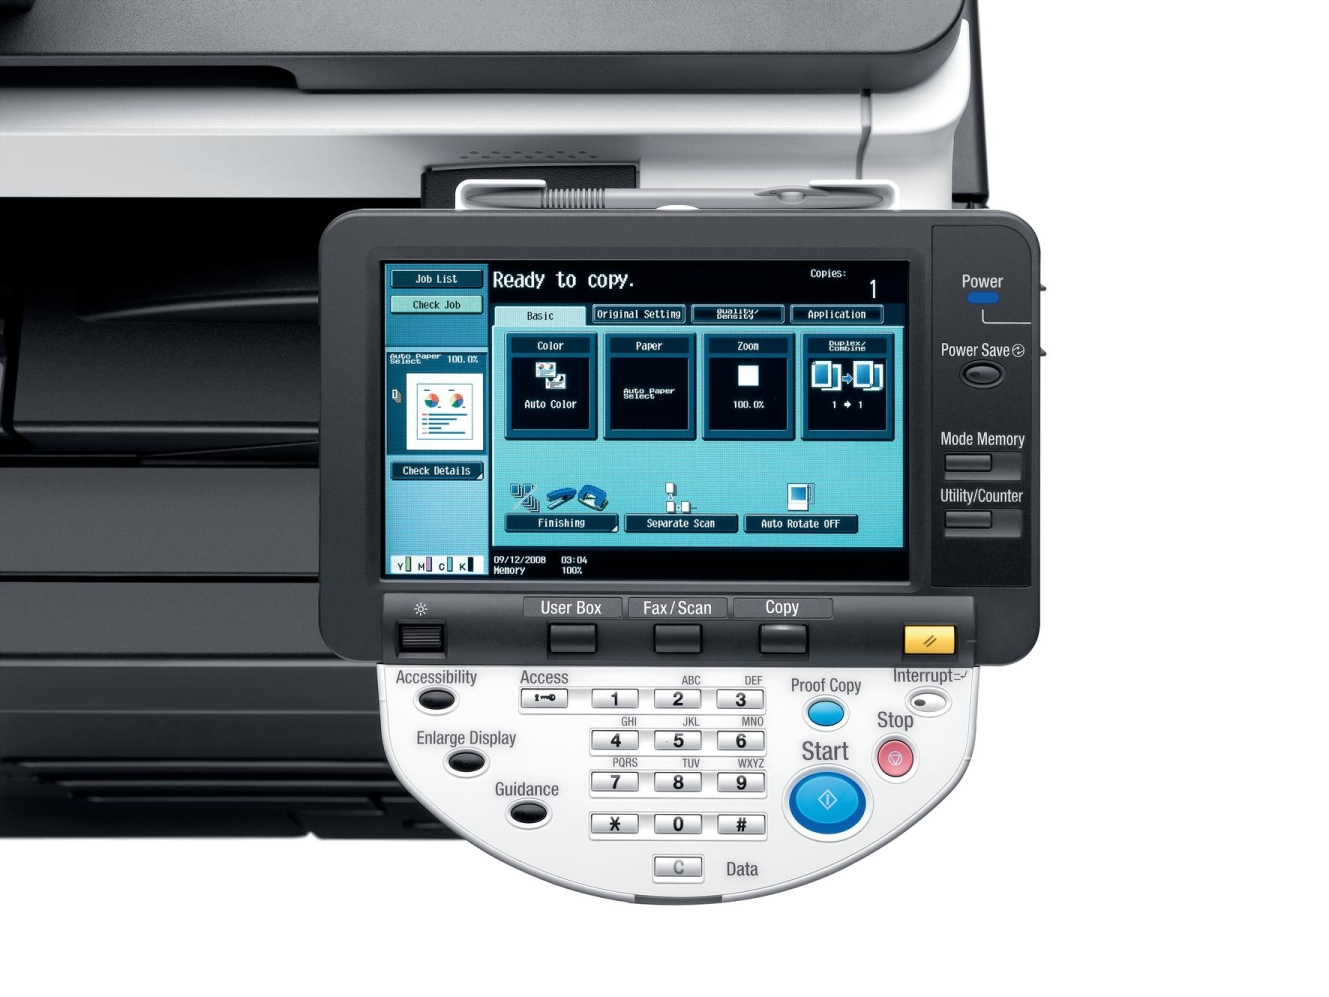 konica minolta bizhub c452 colour copier  printer  scanner